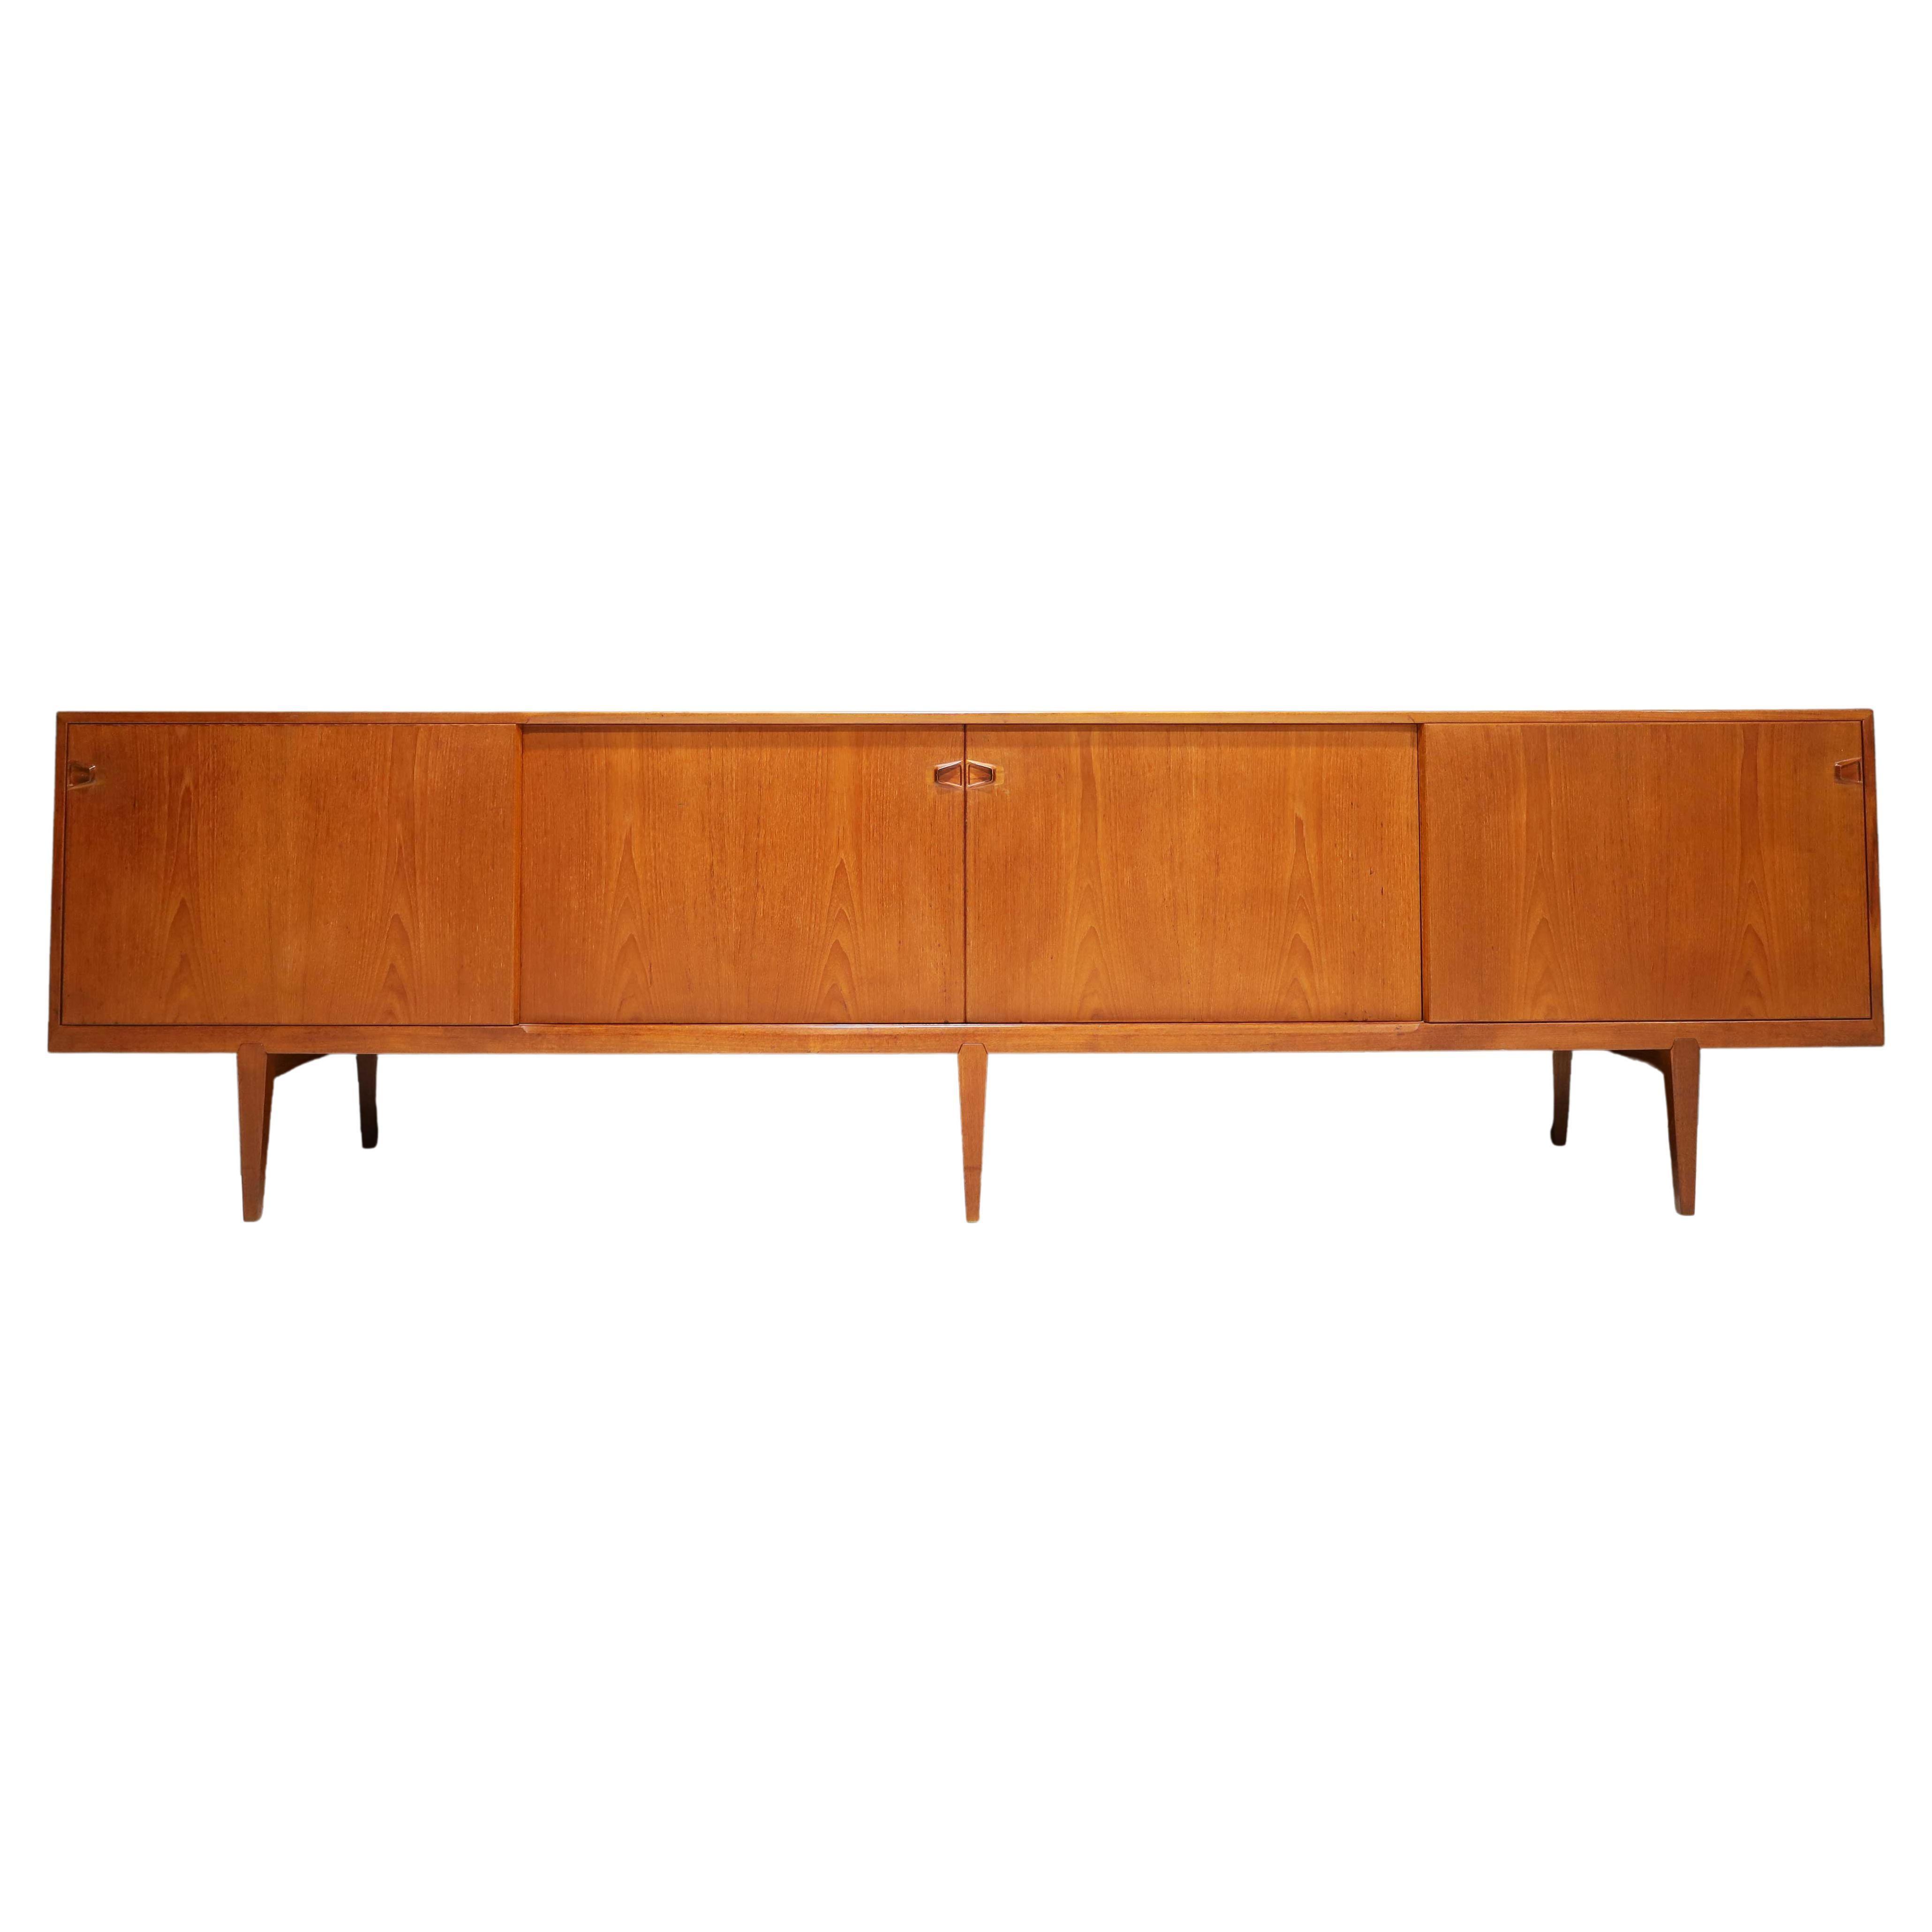 Large 1950s Danish Teak Sideboard by Henry Rosengren Hansen for Brande Møbelindu